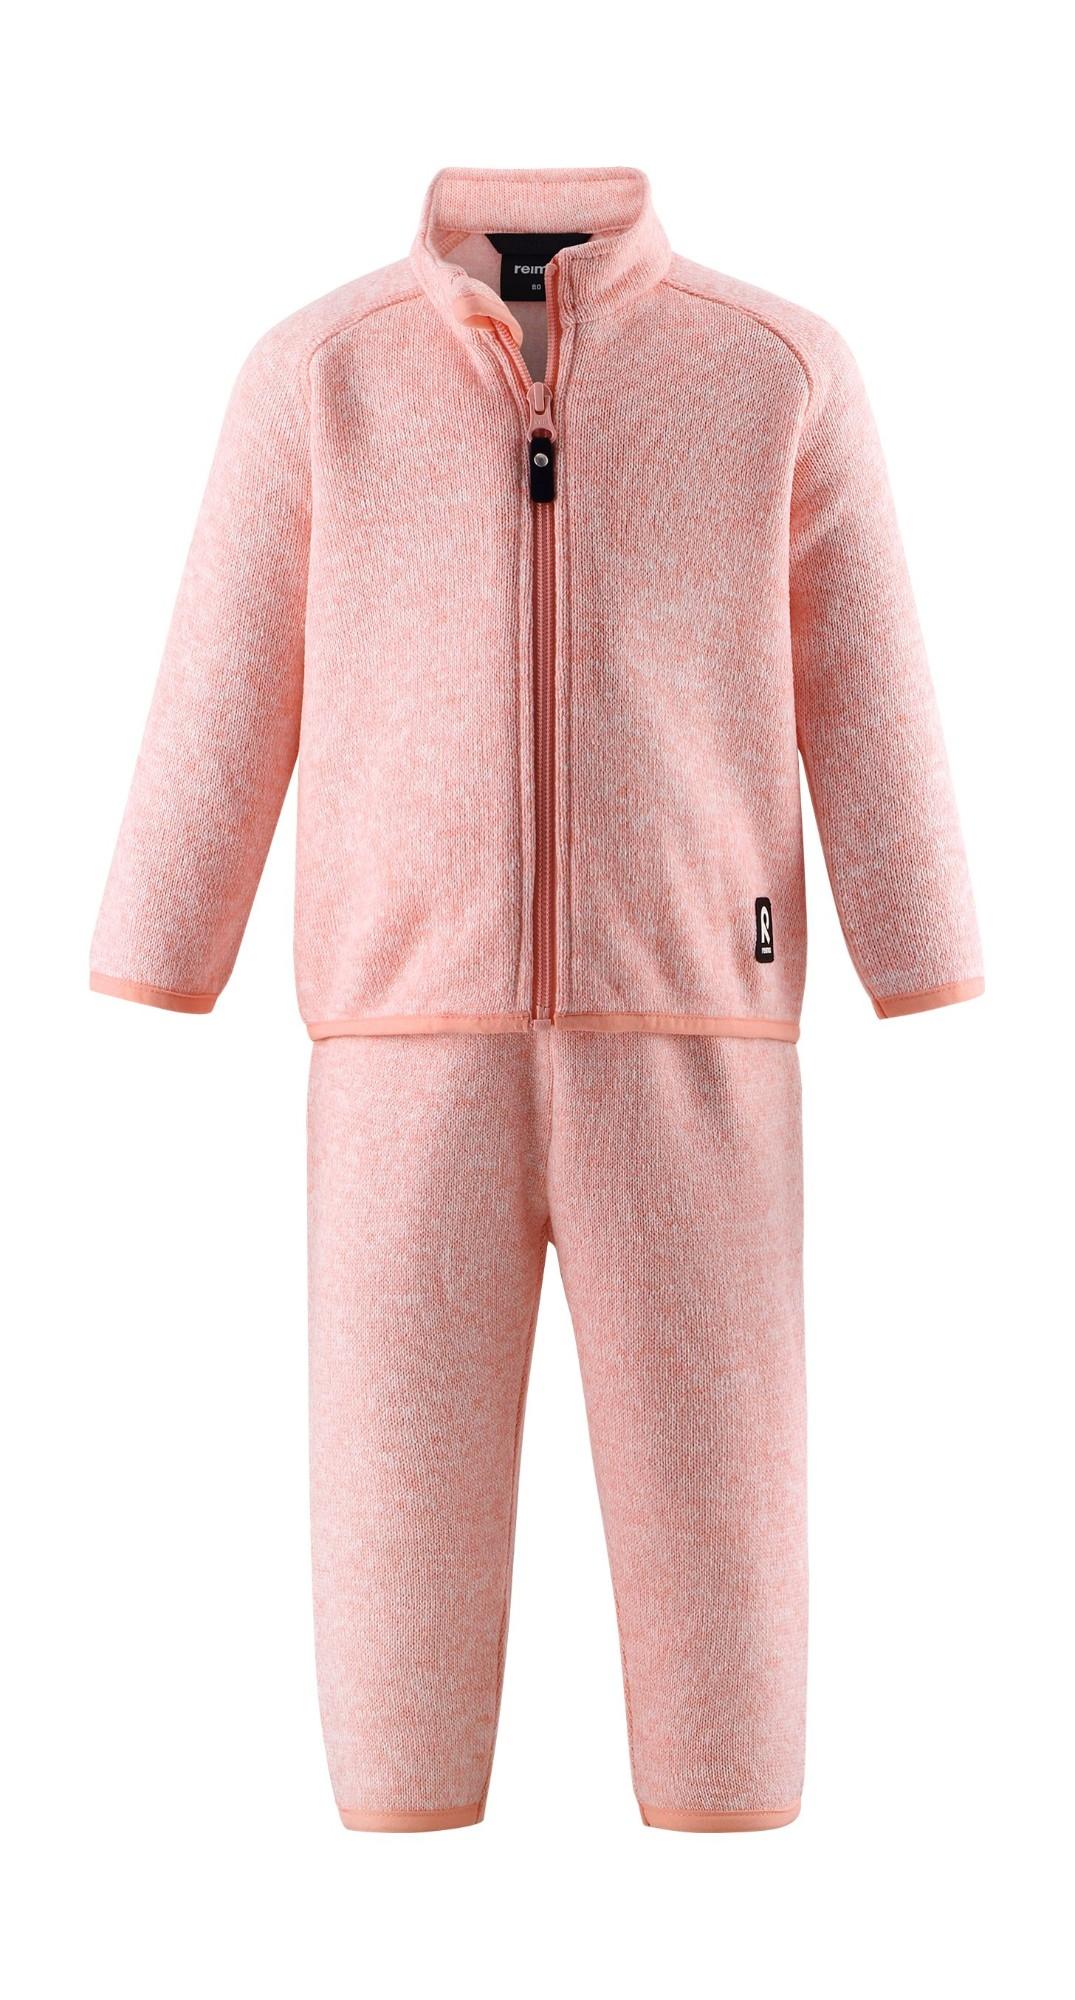 REIMA Tahto Bubblegum Pink 92